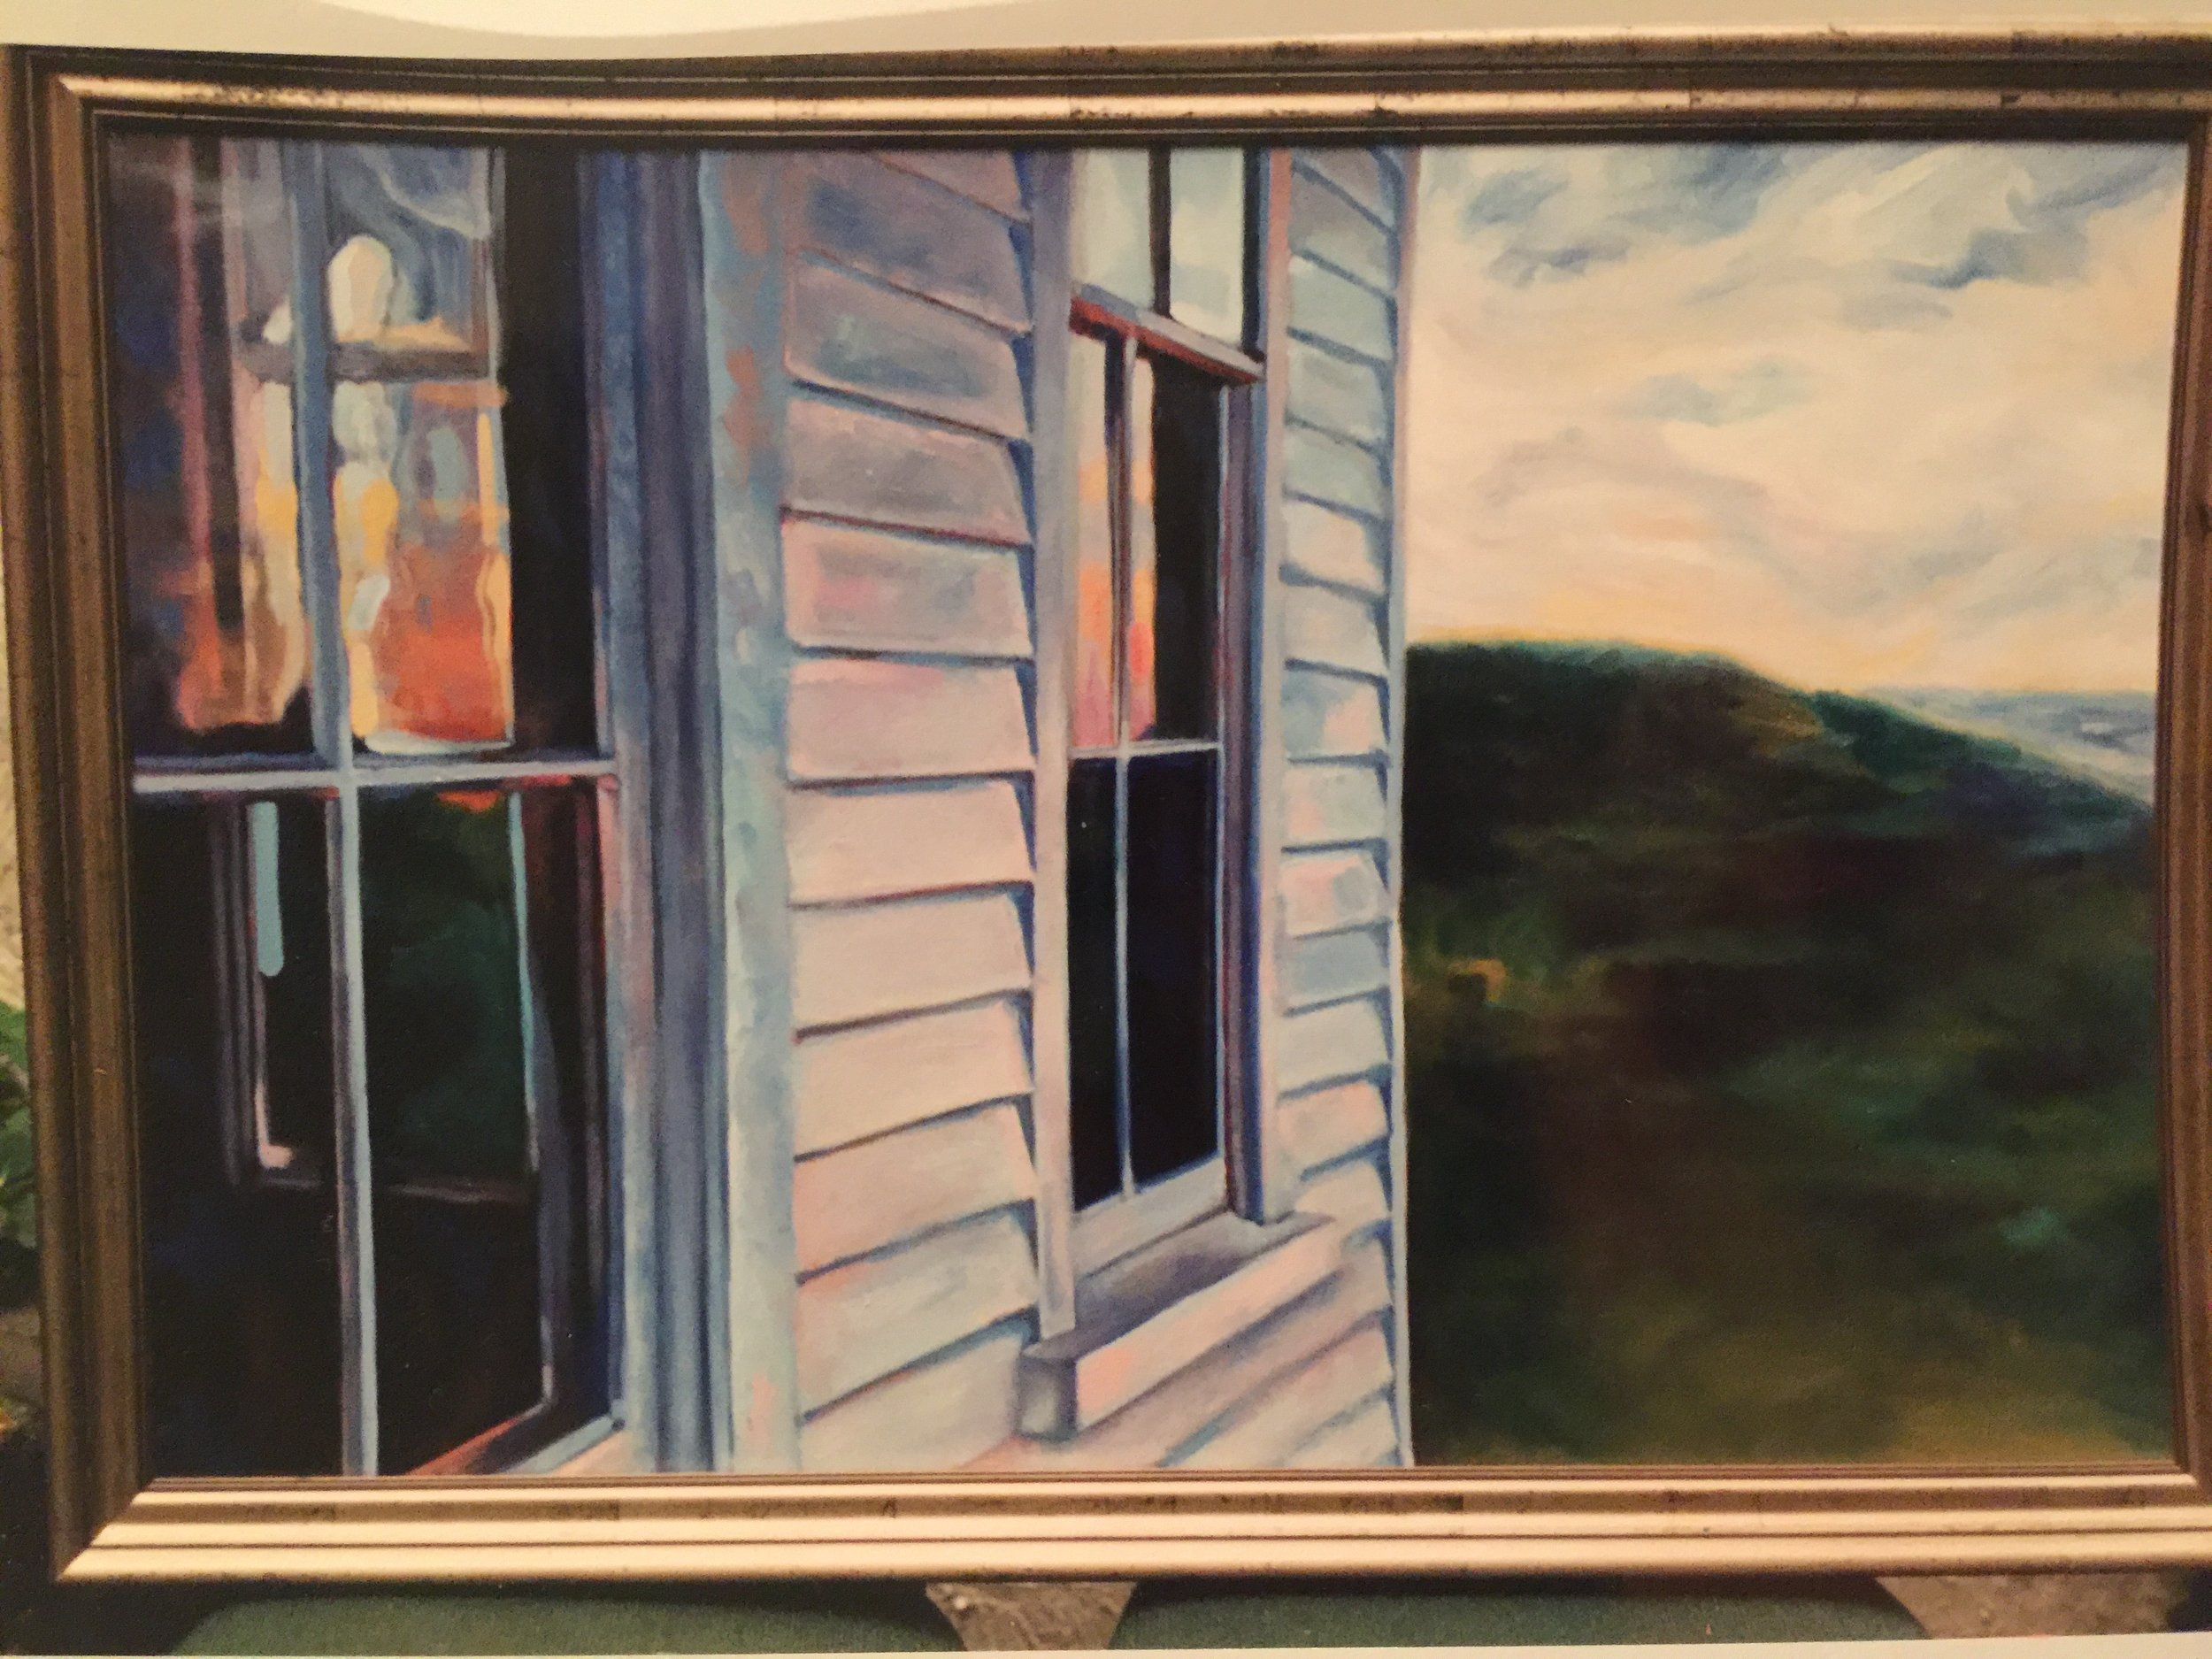 Block Island Windows, 1998